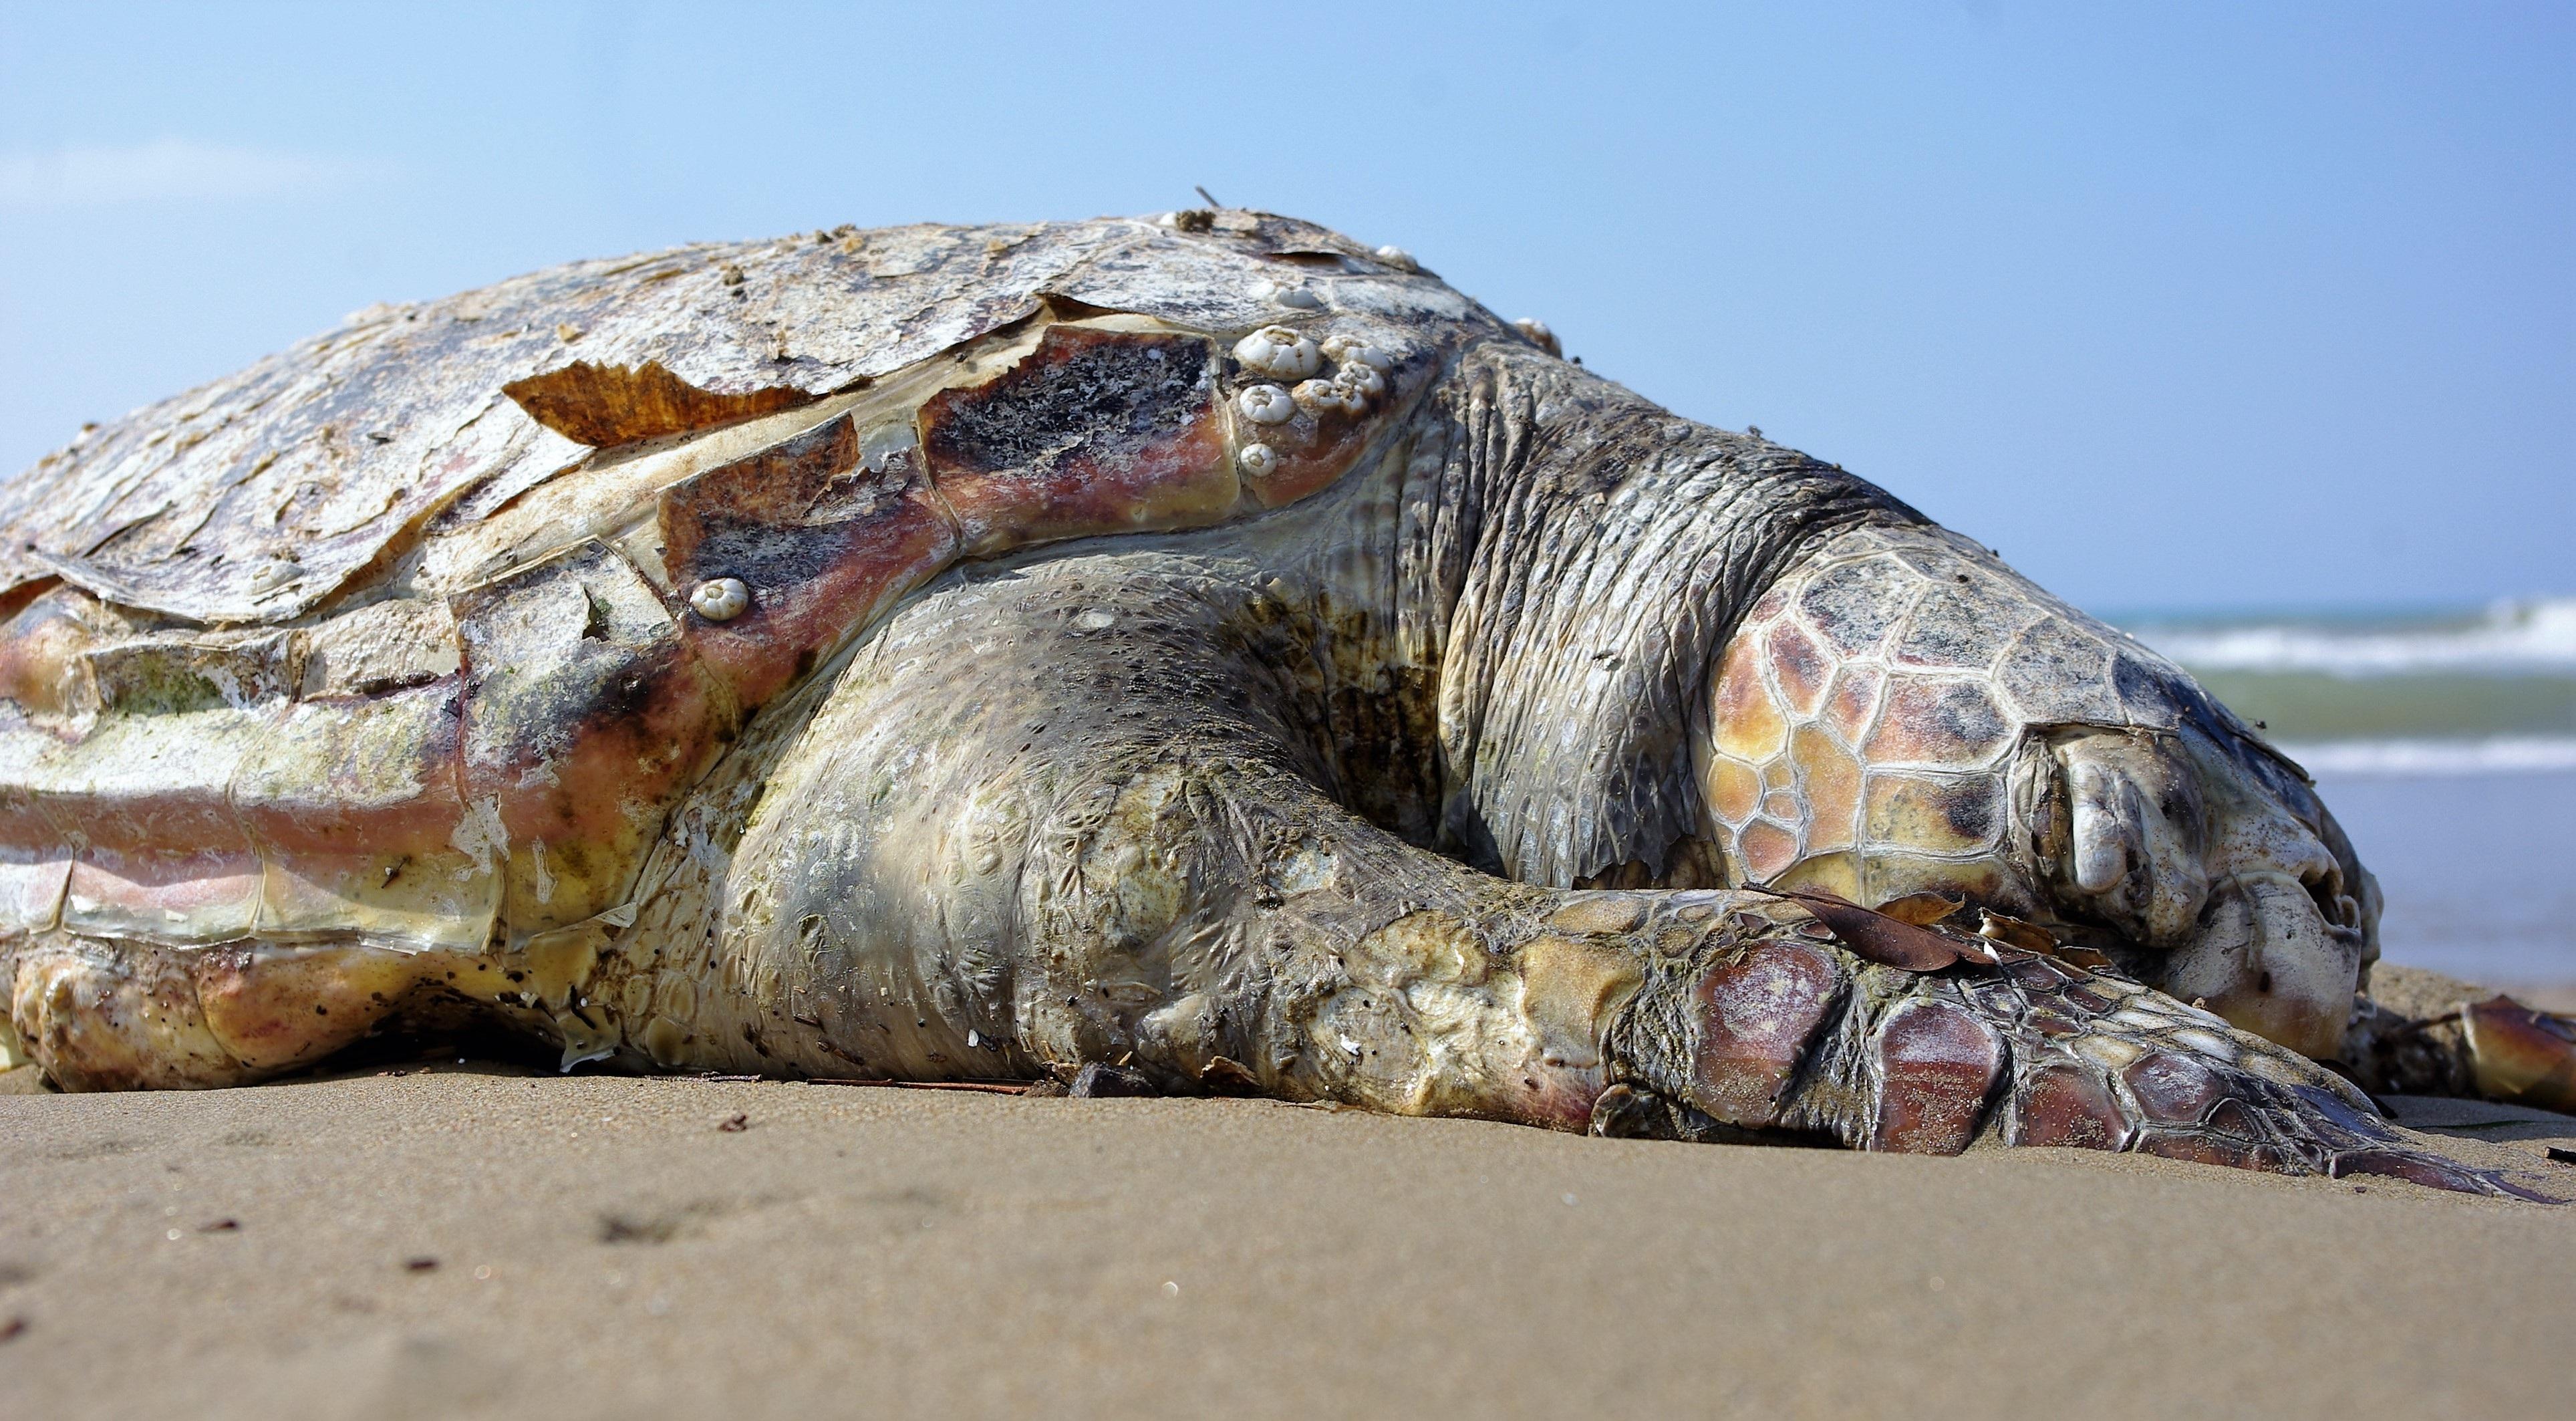 Turtle on the beach photo